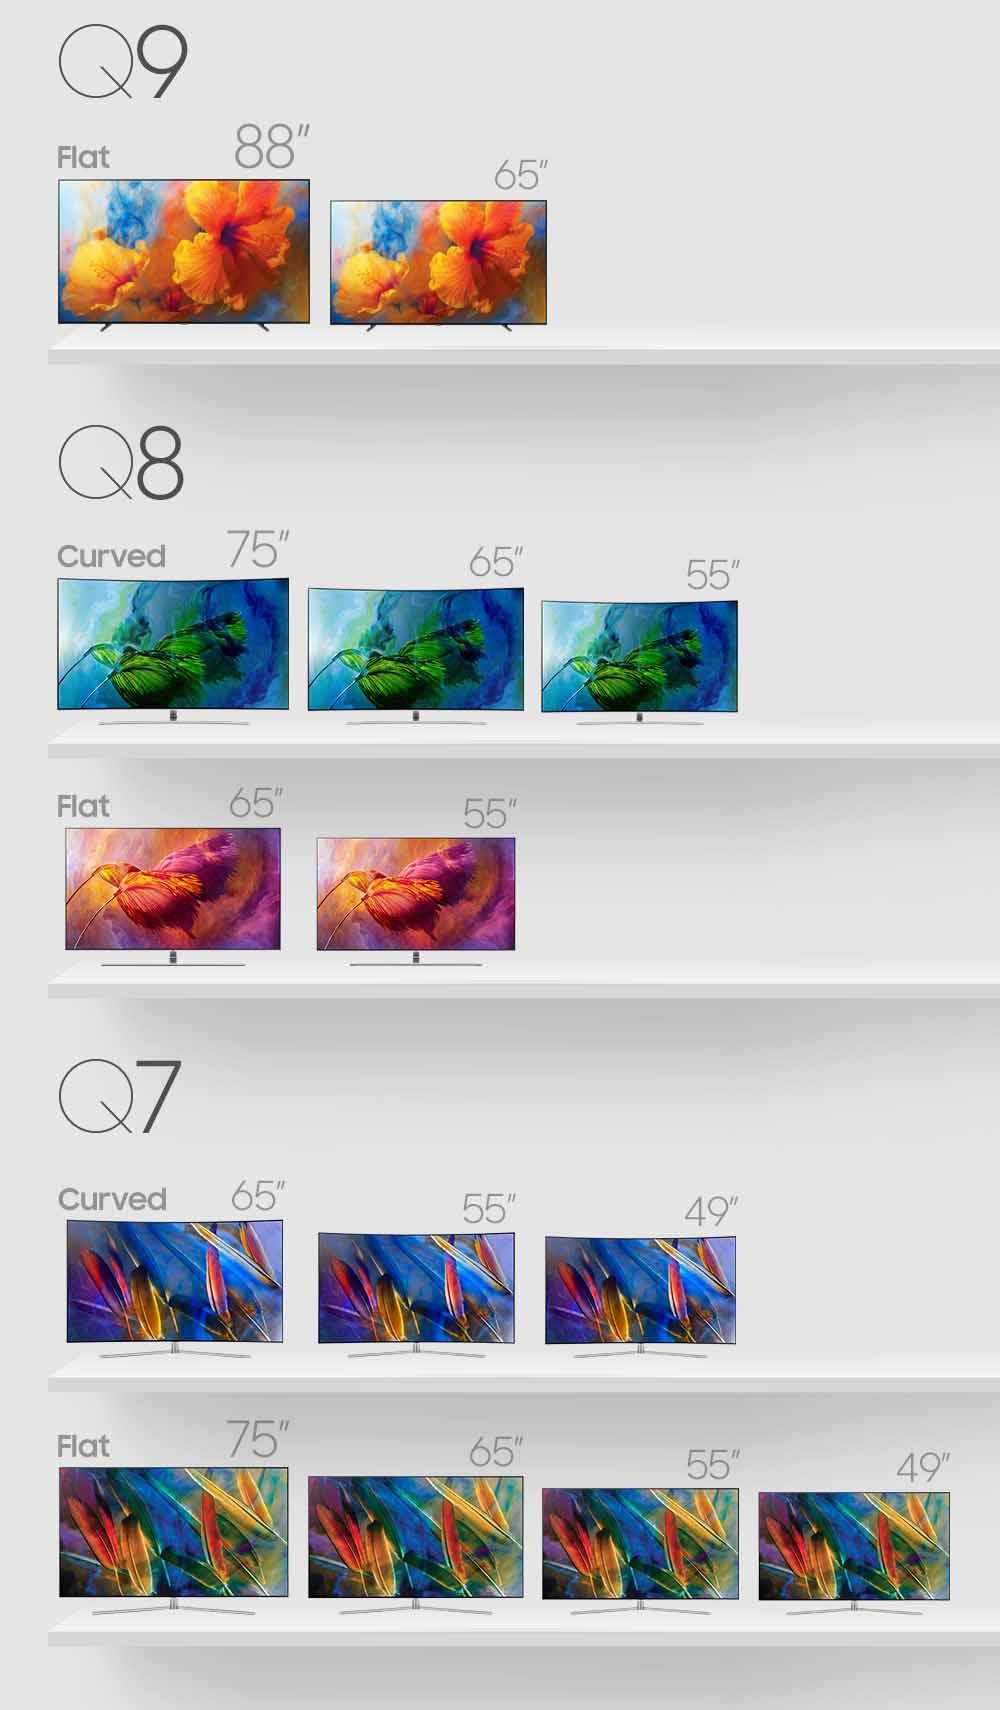 Gama QLED TV Samsung